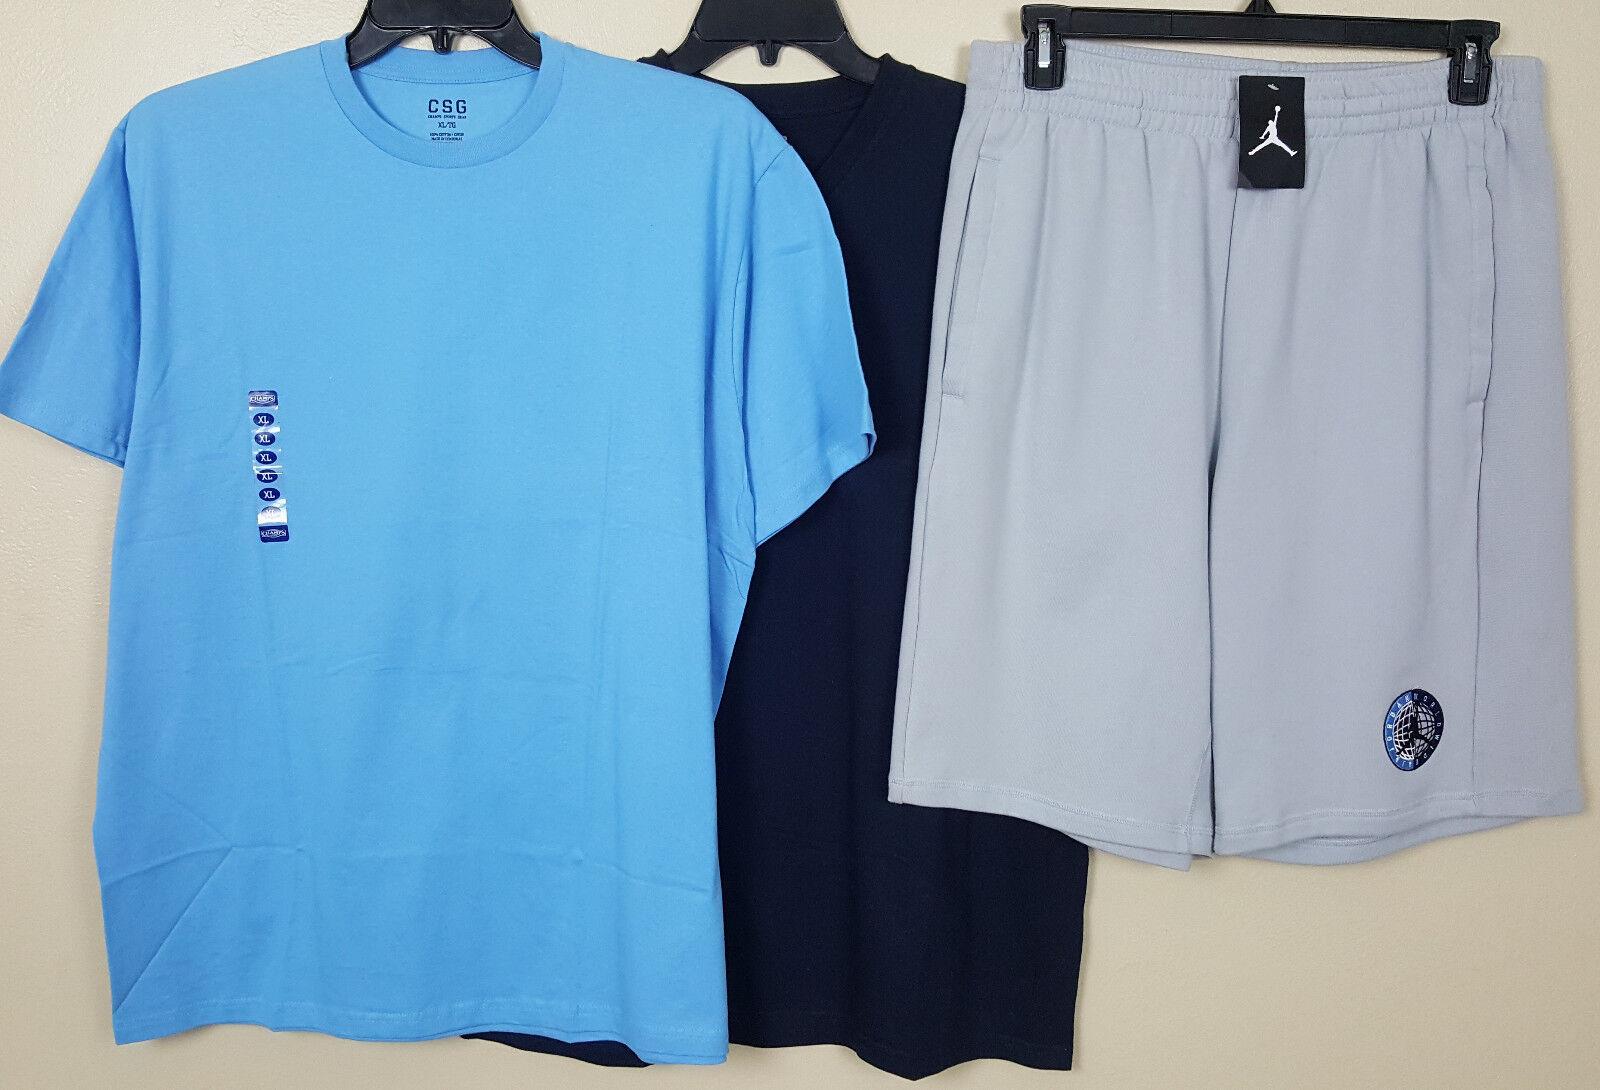 Nike air jordan jordan jordan ix retrò 9 pantaloncini   2 camicie blu polvere grigia, zio nuovo (dimensioni xl) 743f9e